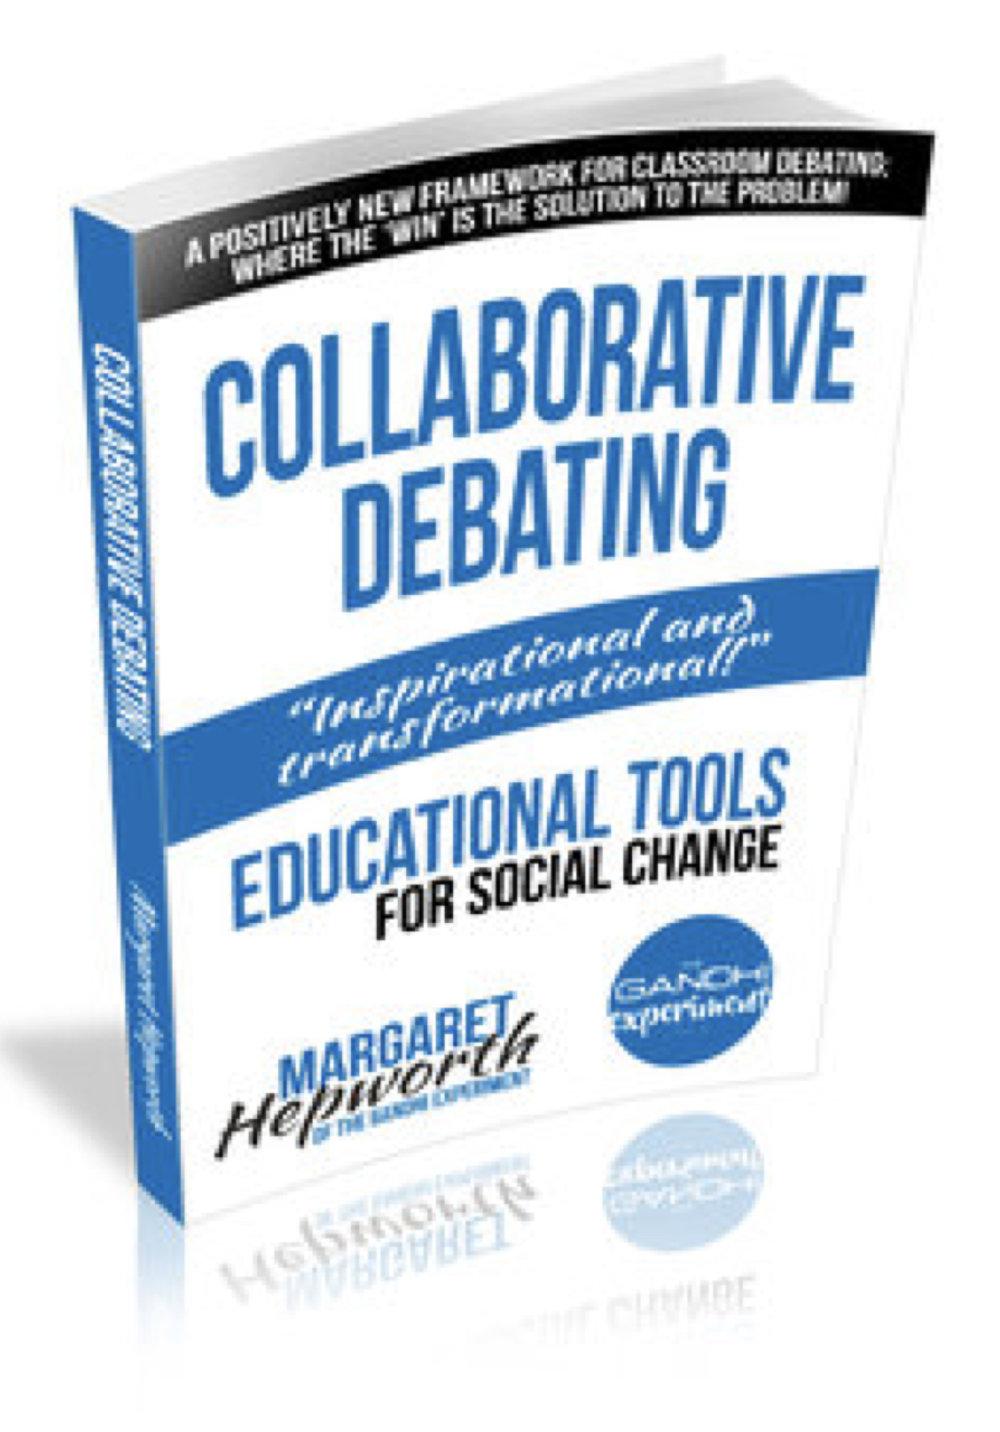 Collaborative Debating Margaret Hepworth